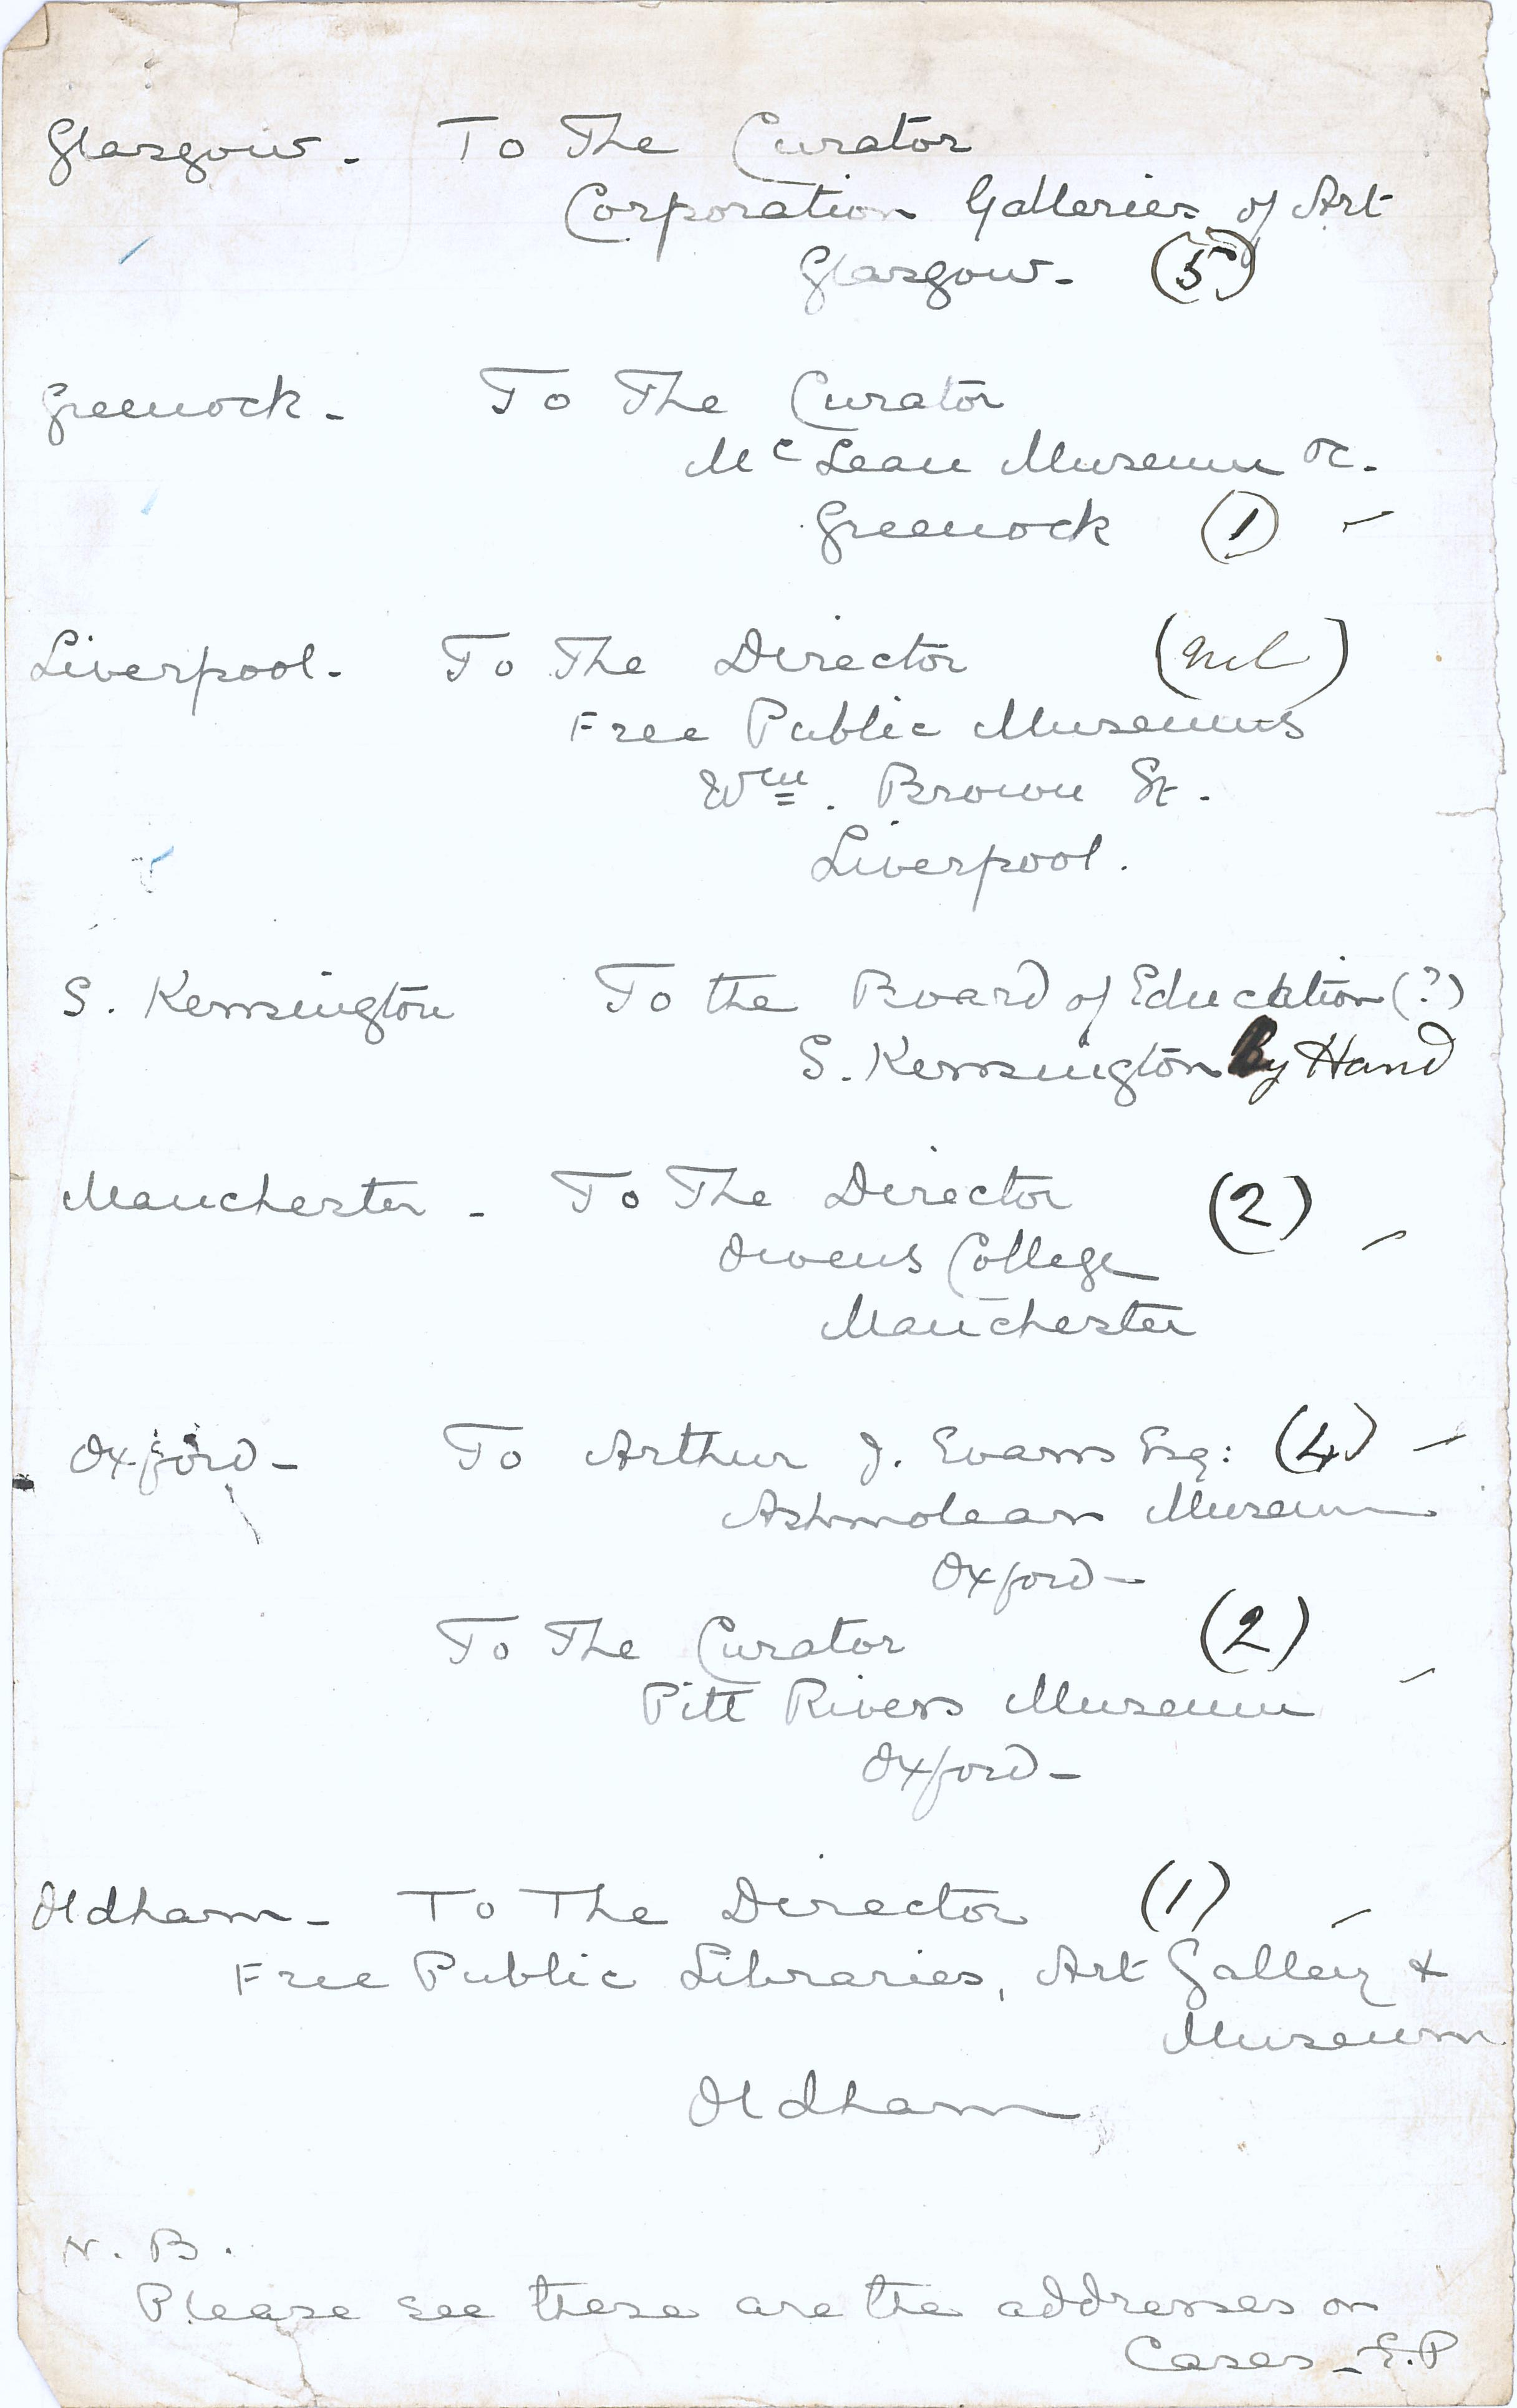 1904-05 Deir el-Bahri, Sinai, Oxyrhynchus DIST.24.03b